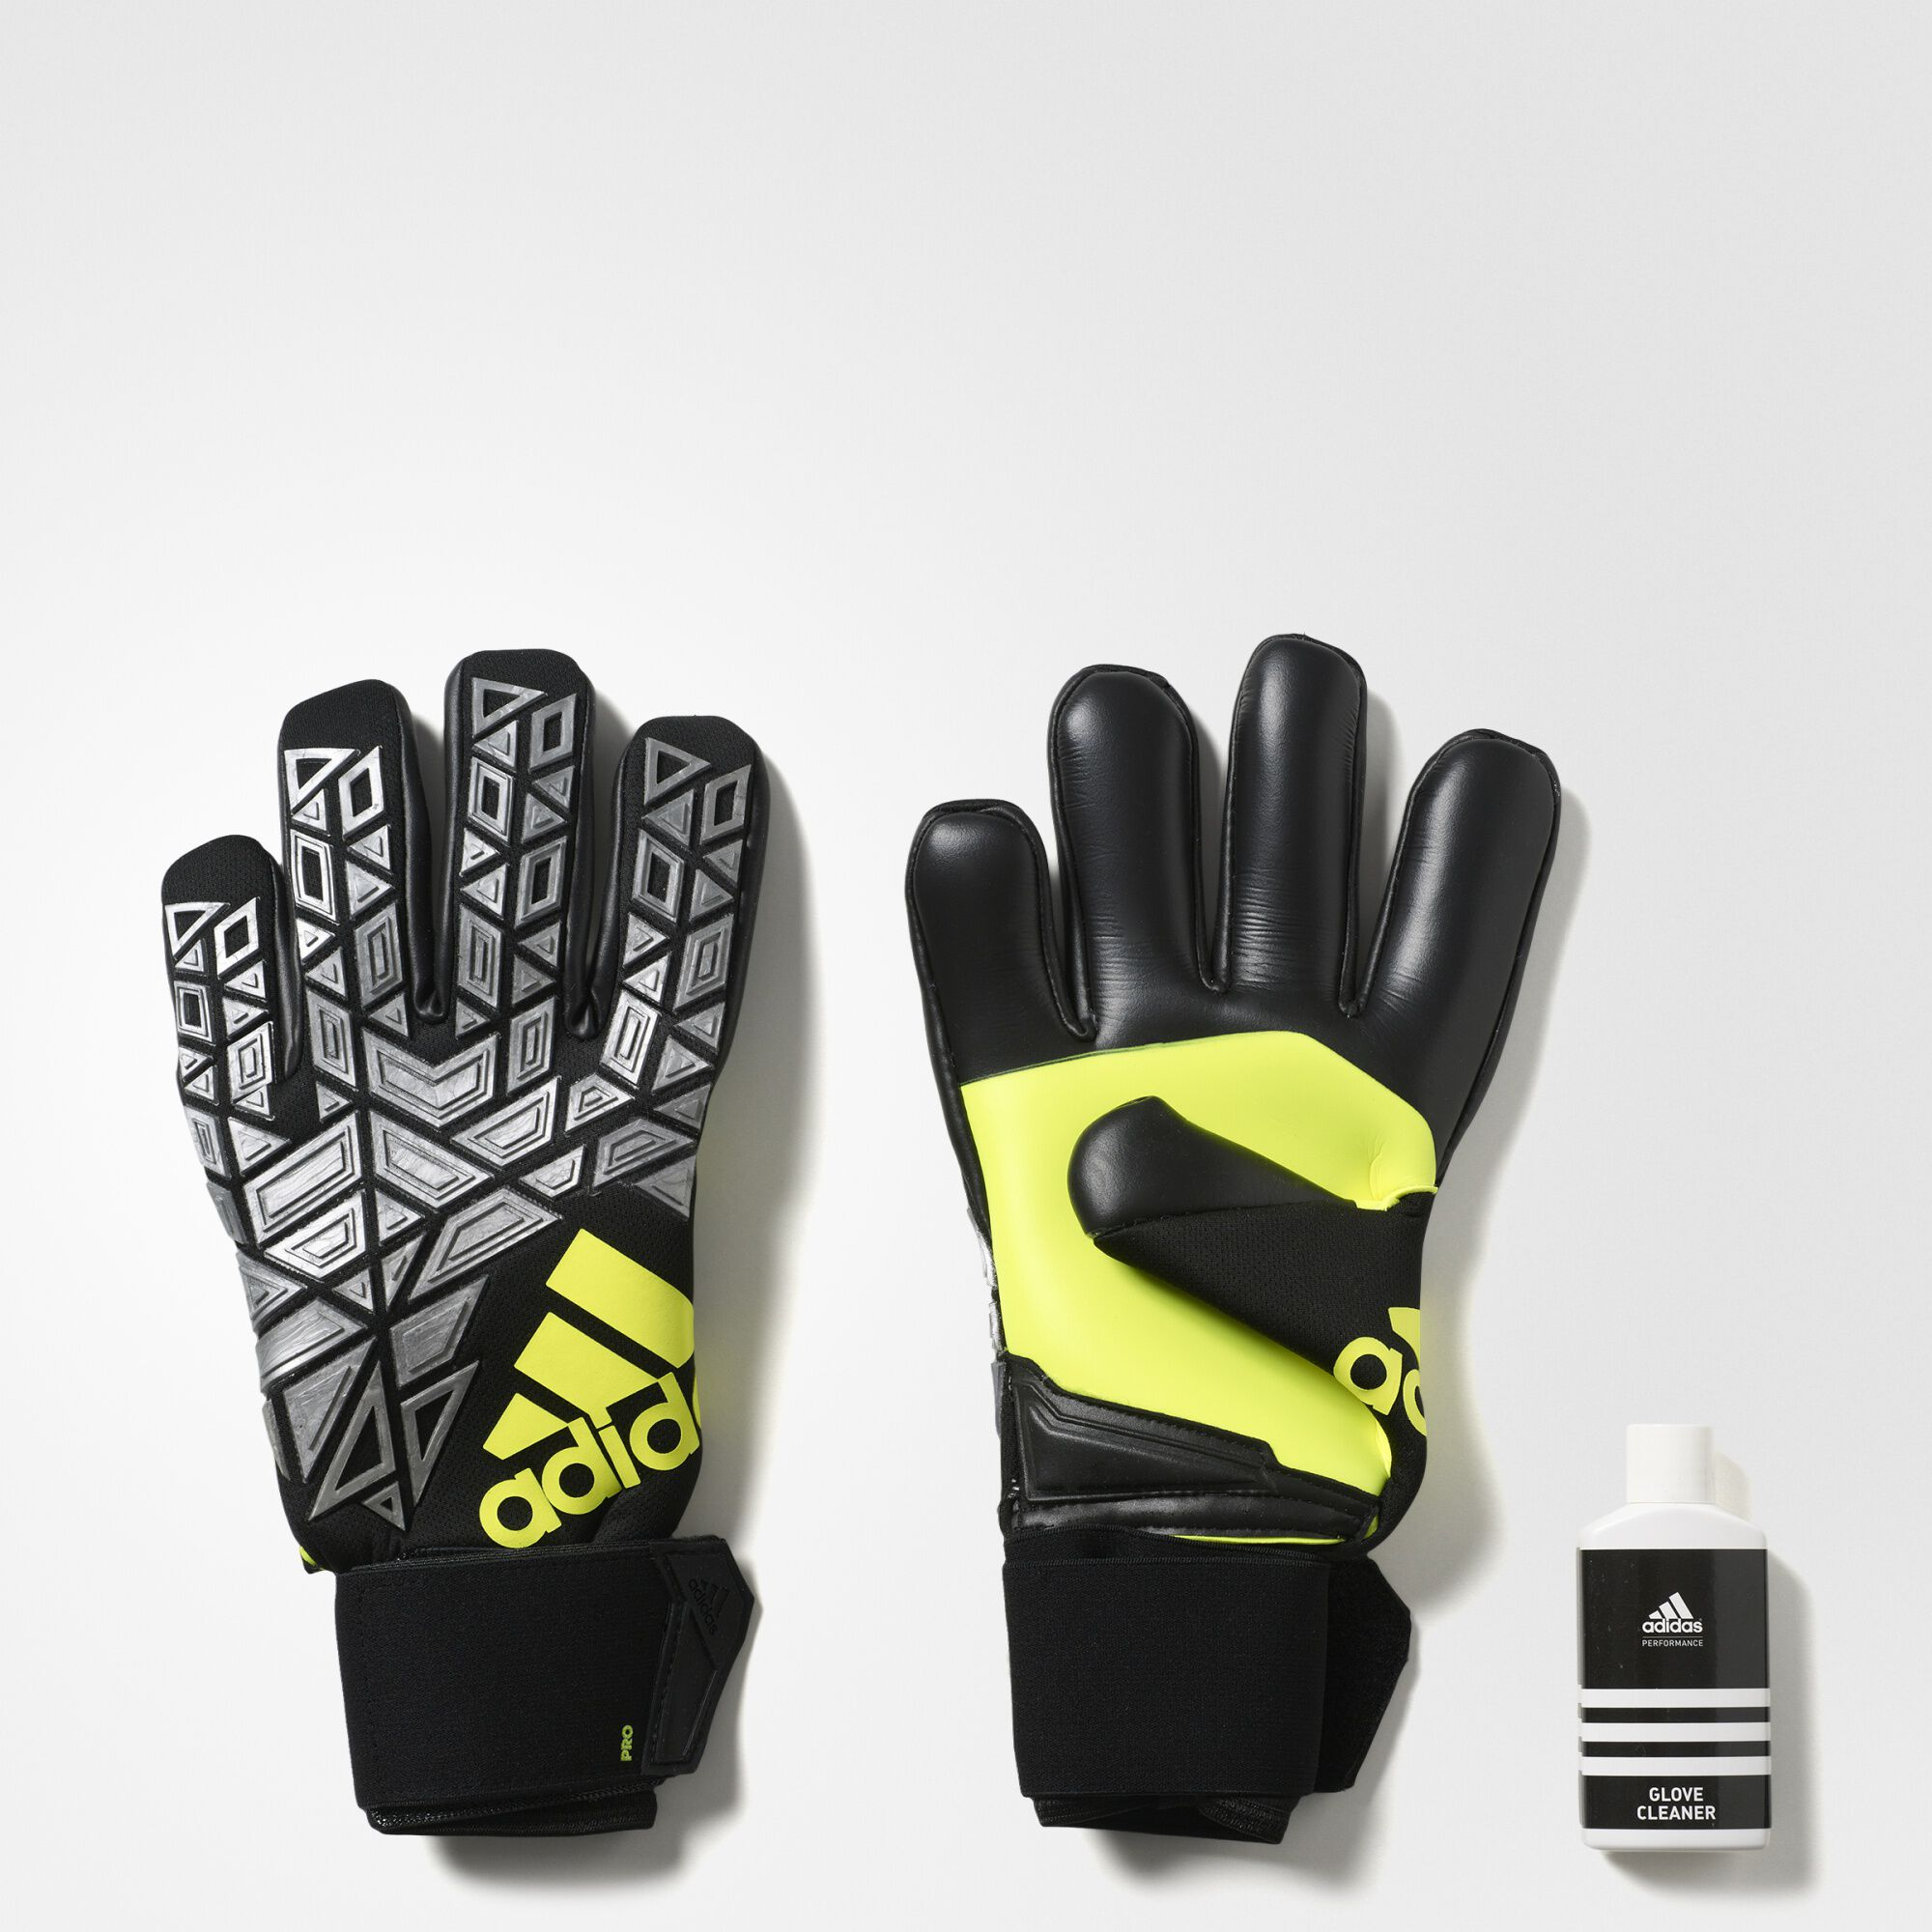 adidas ace pro goalkeeper gloves black adidas us. Black Bedroom Furniture Sets. Home Design Ideas